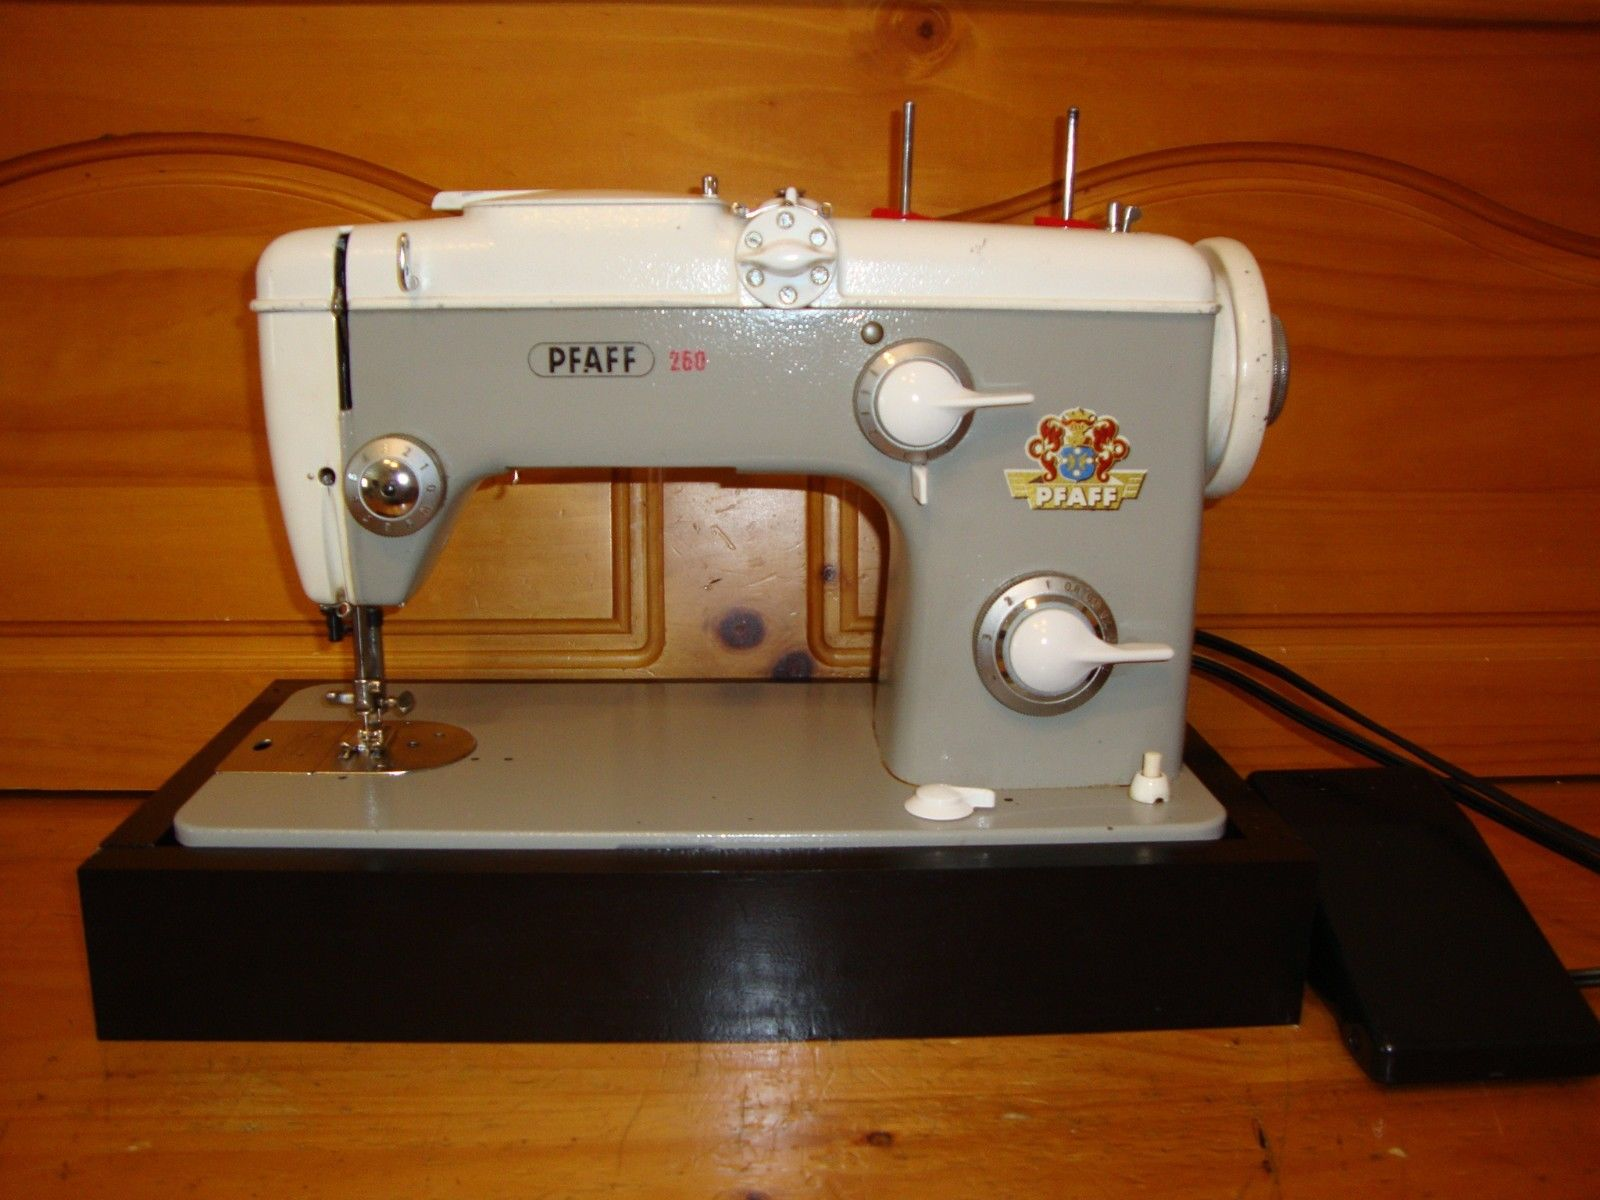 pfaff 260 sewing machine for sale